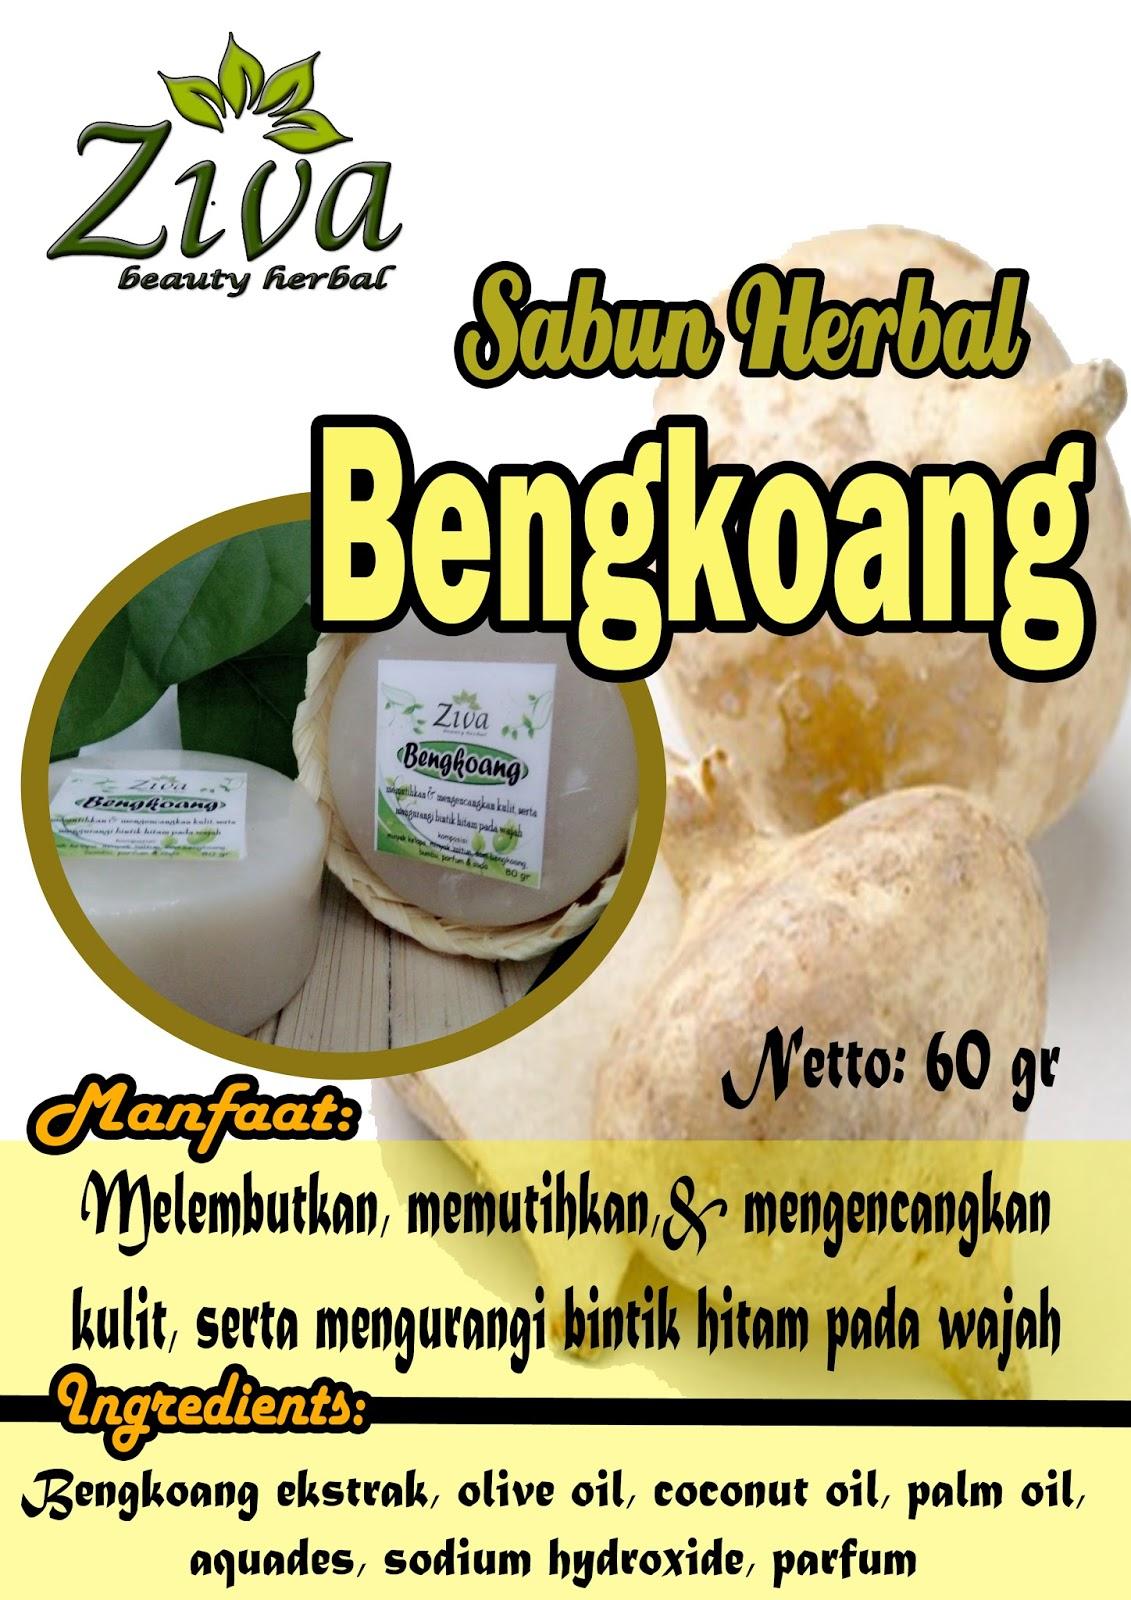 Harga Jual Sabun Sereh Plus Ekstrak Minyak Zaitun Penghilang Jerawat Kecantikan Herbal Tashiru Ziva Bengkoang Adalah Yang Diramu Dari Bahan Dasar Sendiri Memiliki Kandungan Vitamin C